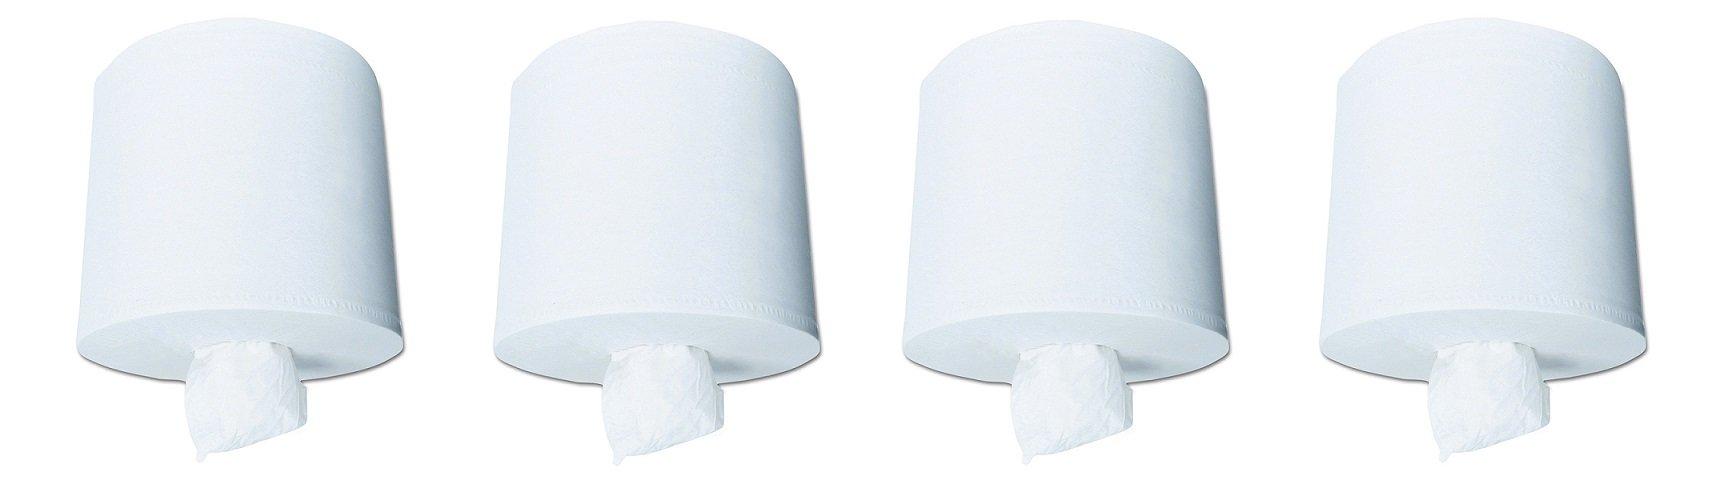 Scott Center Pull Paper Towels (01010), White, Perforated Hand Paper Towels, 500 Towels / Roll, 4 Rolls / Case (4-(4 Rolls / Case))